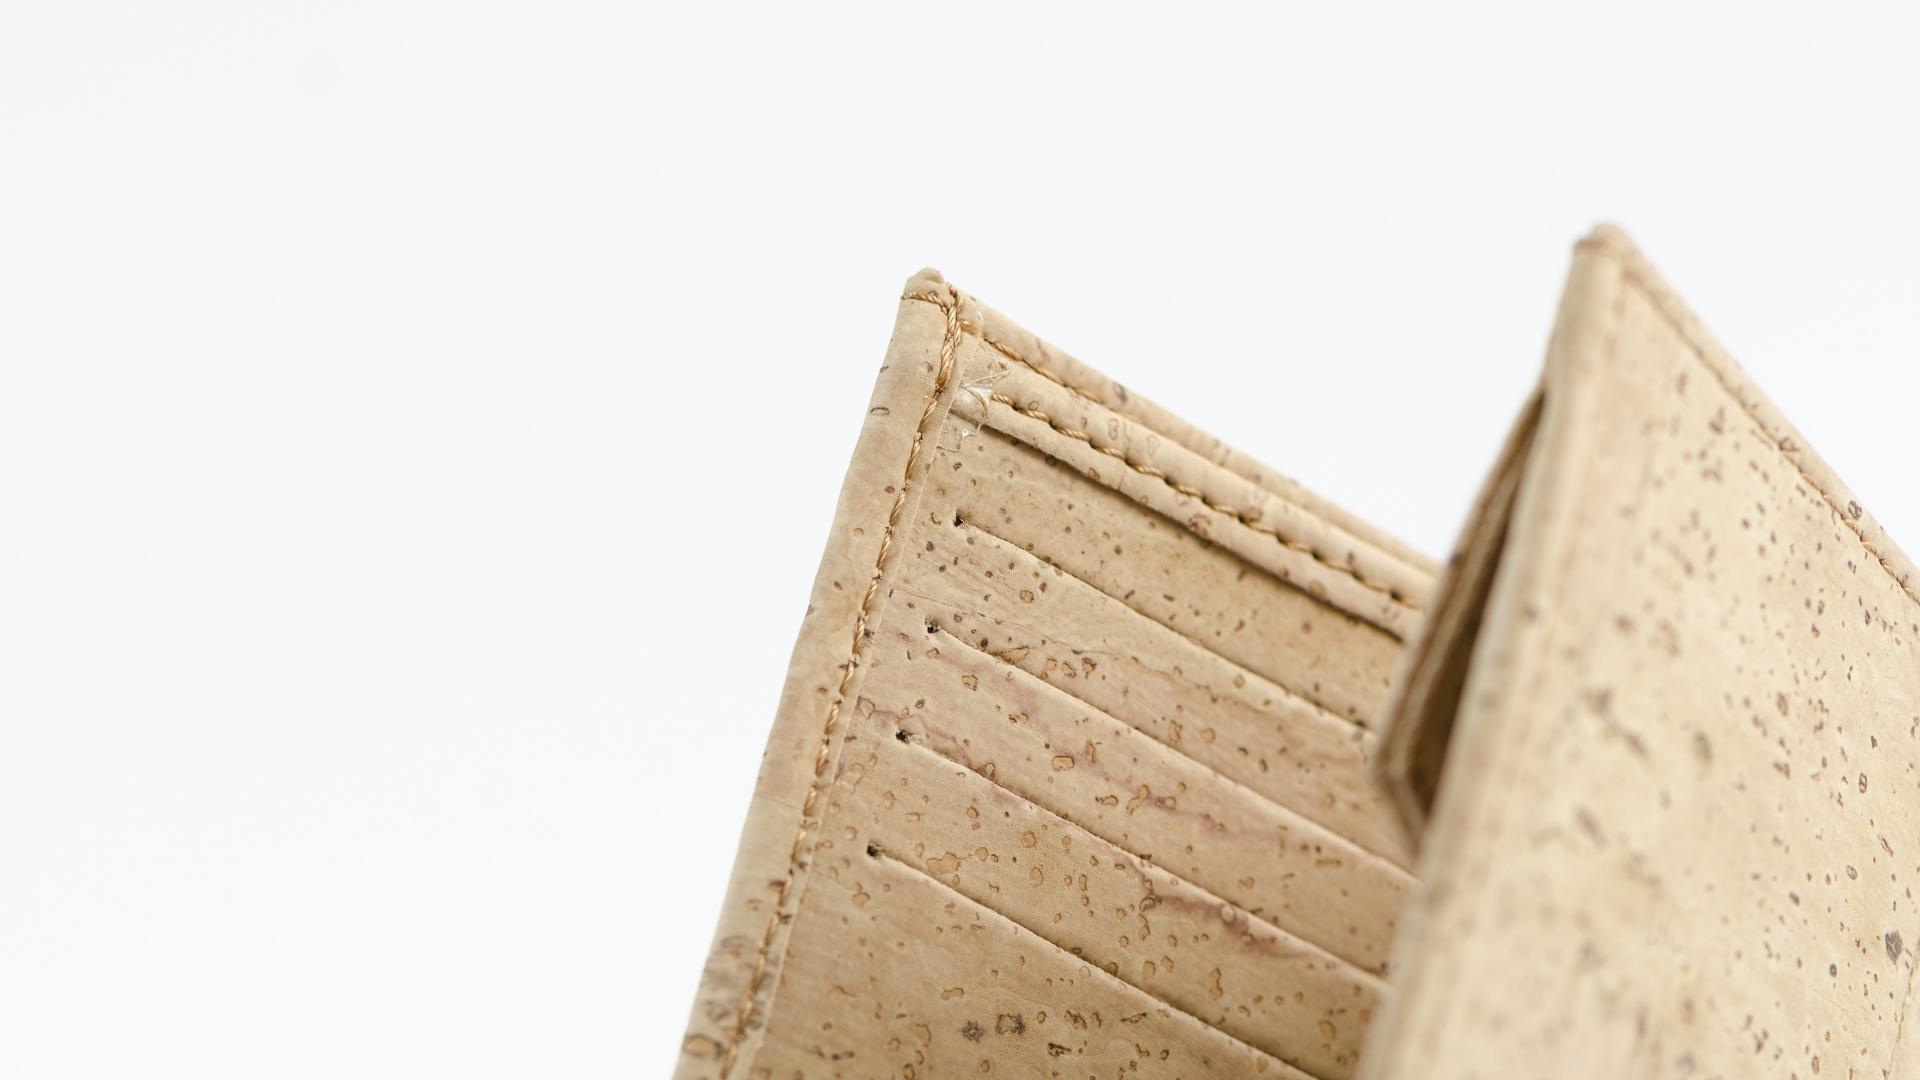 Korkportemonnaie, Kork Portemonnaie Men's Wallet M, Nature Cork, editorial